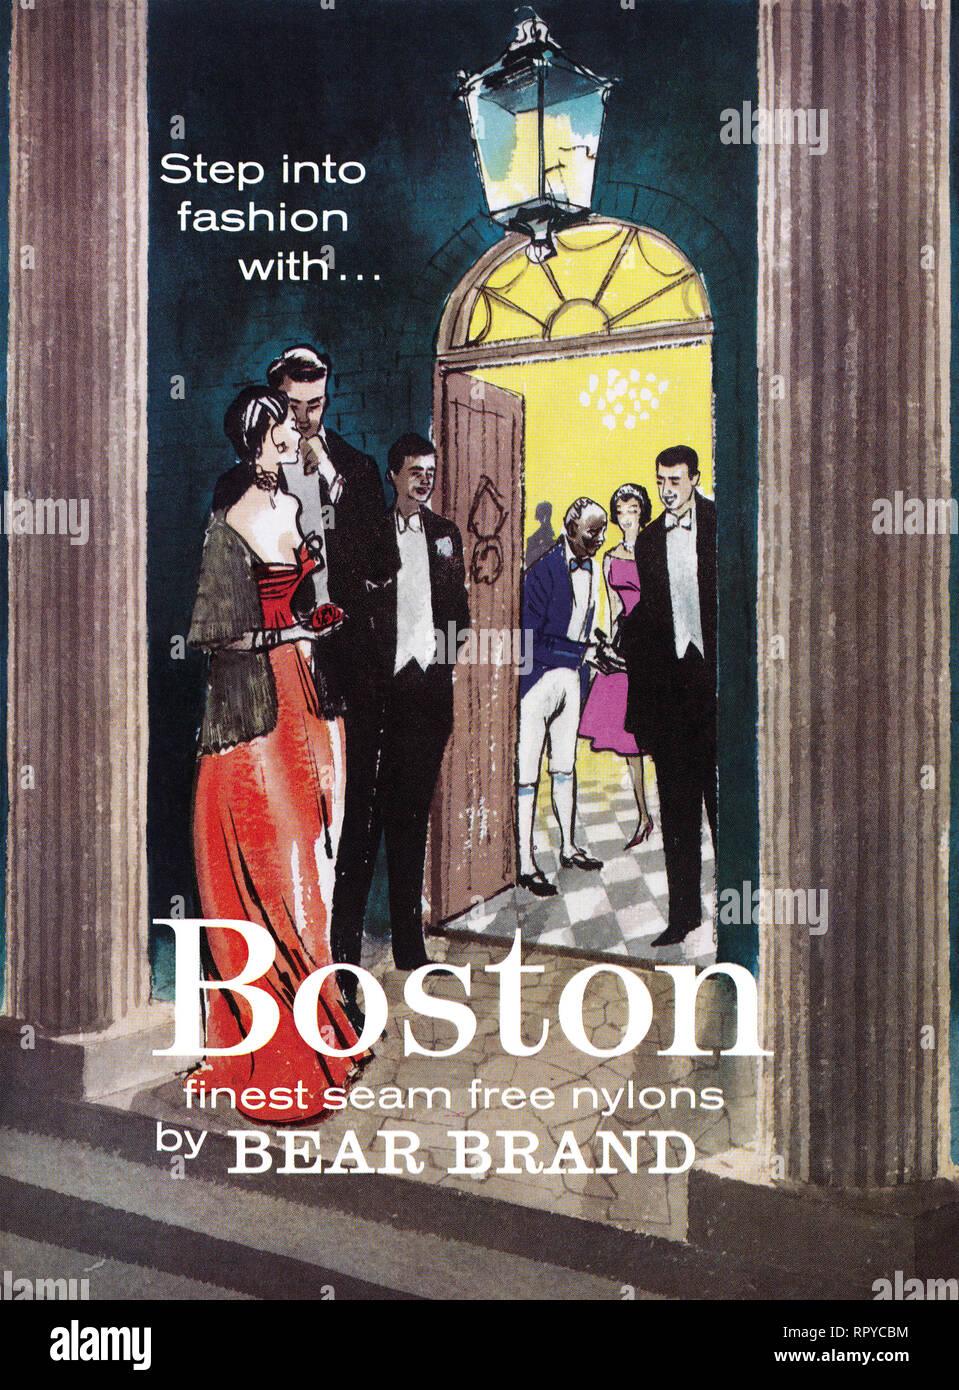 e06fb6071 1959 British advertisement for Boston seam-free nylon stockings by Bear  Brand. - Stock